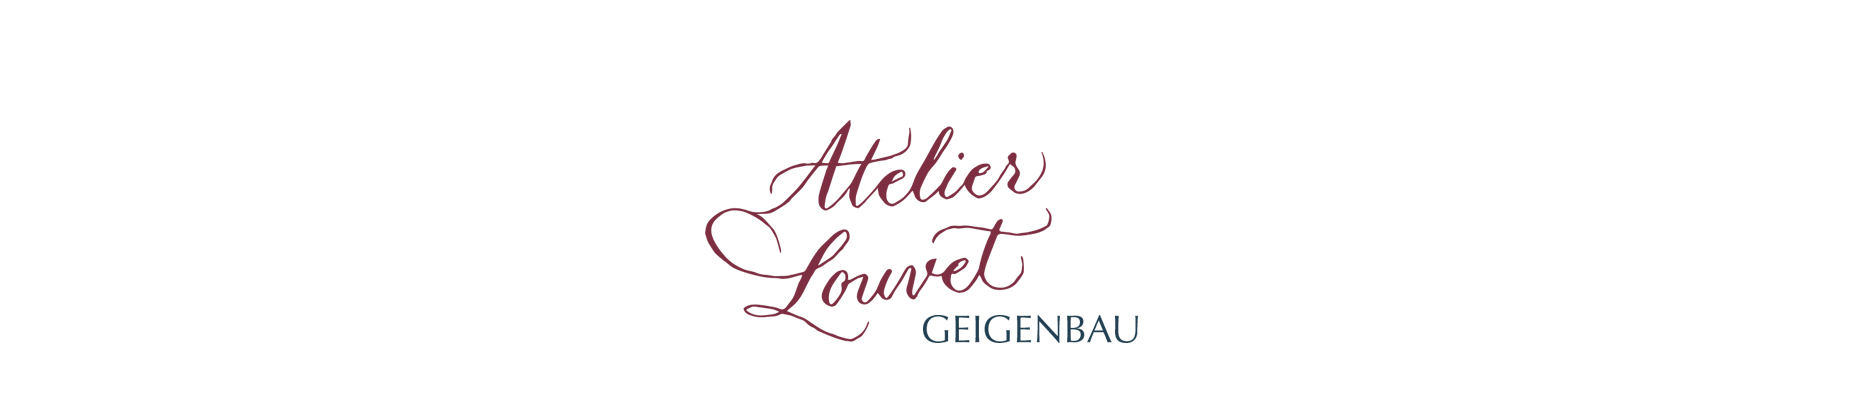 Atelier Louvet Geigenbau